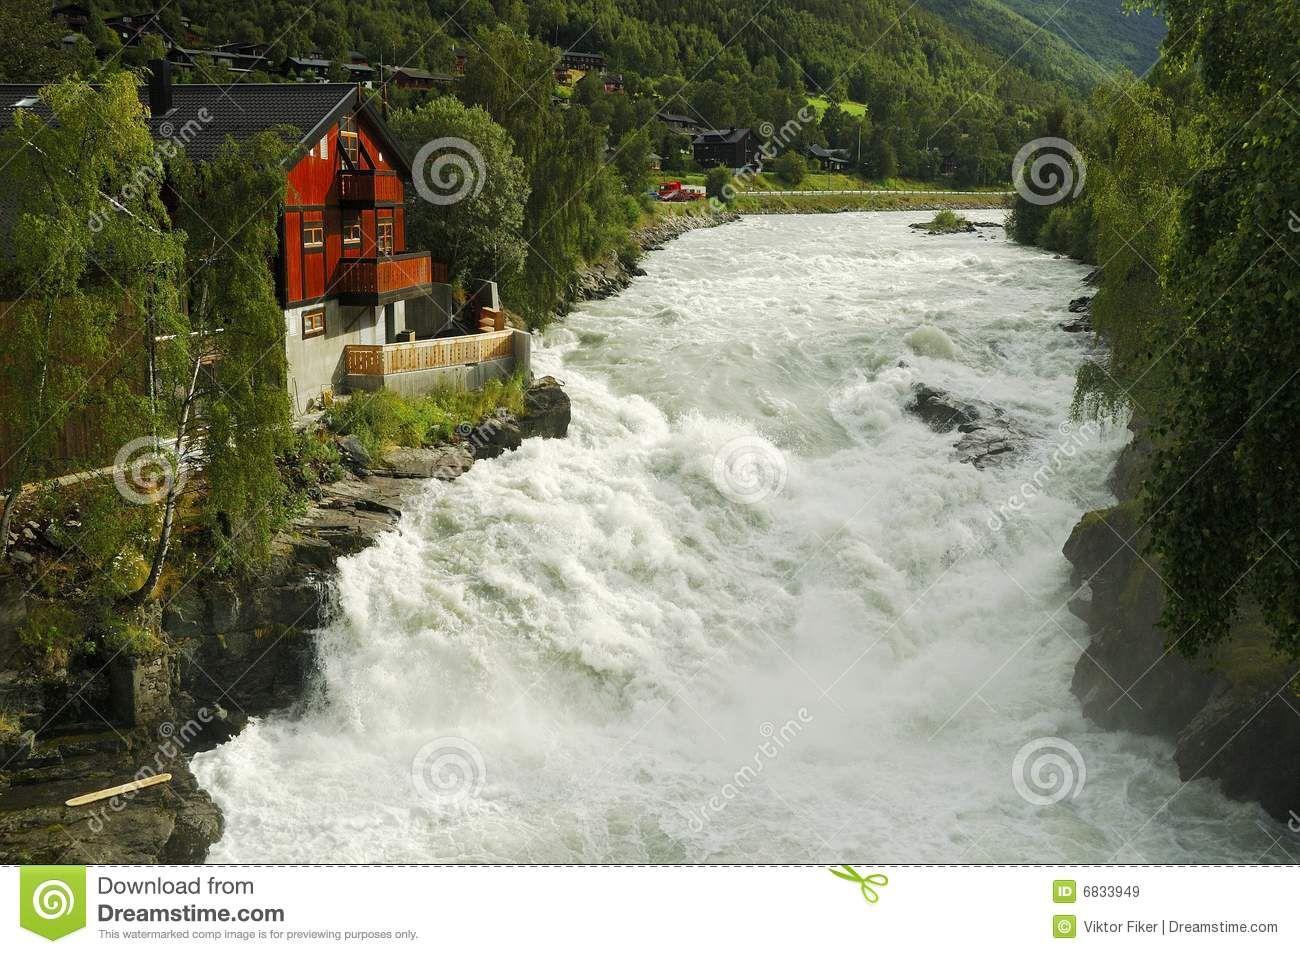 arquitectura+fiker | Imagens de Stock Royalty Free: Rio selvagem - Lom, Noruega